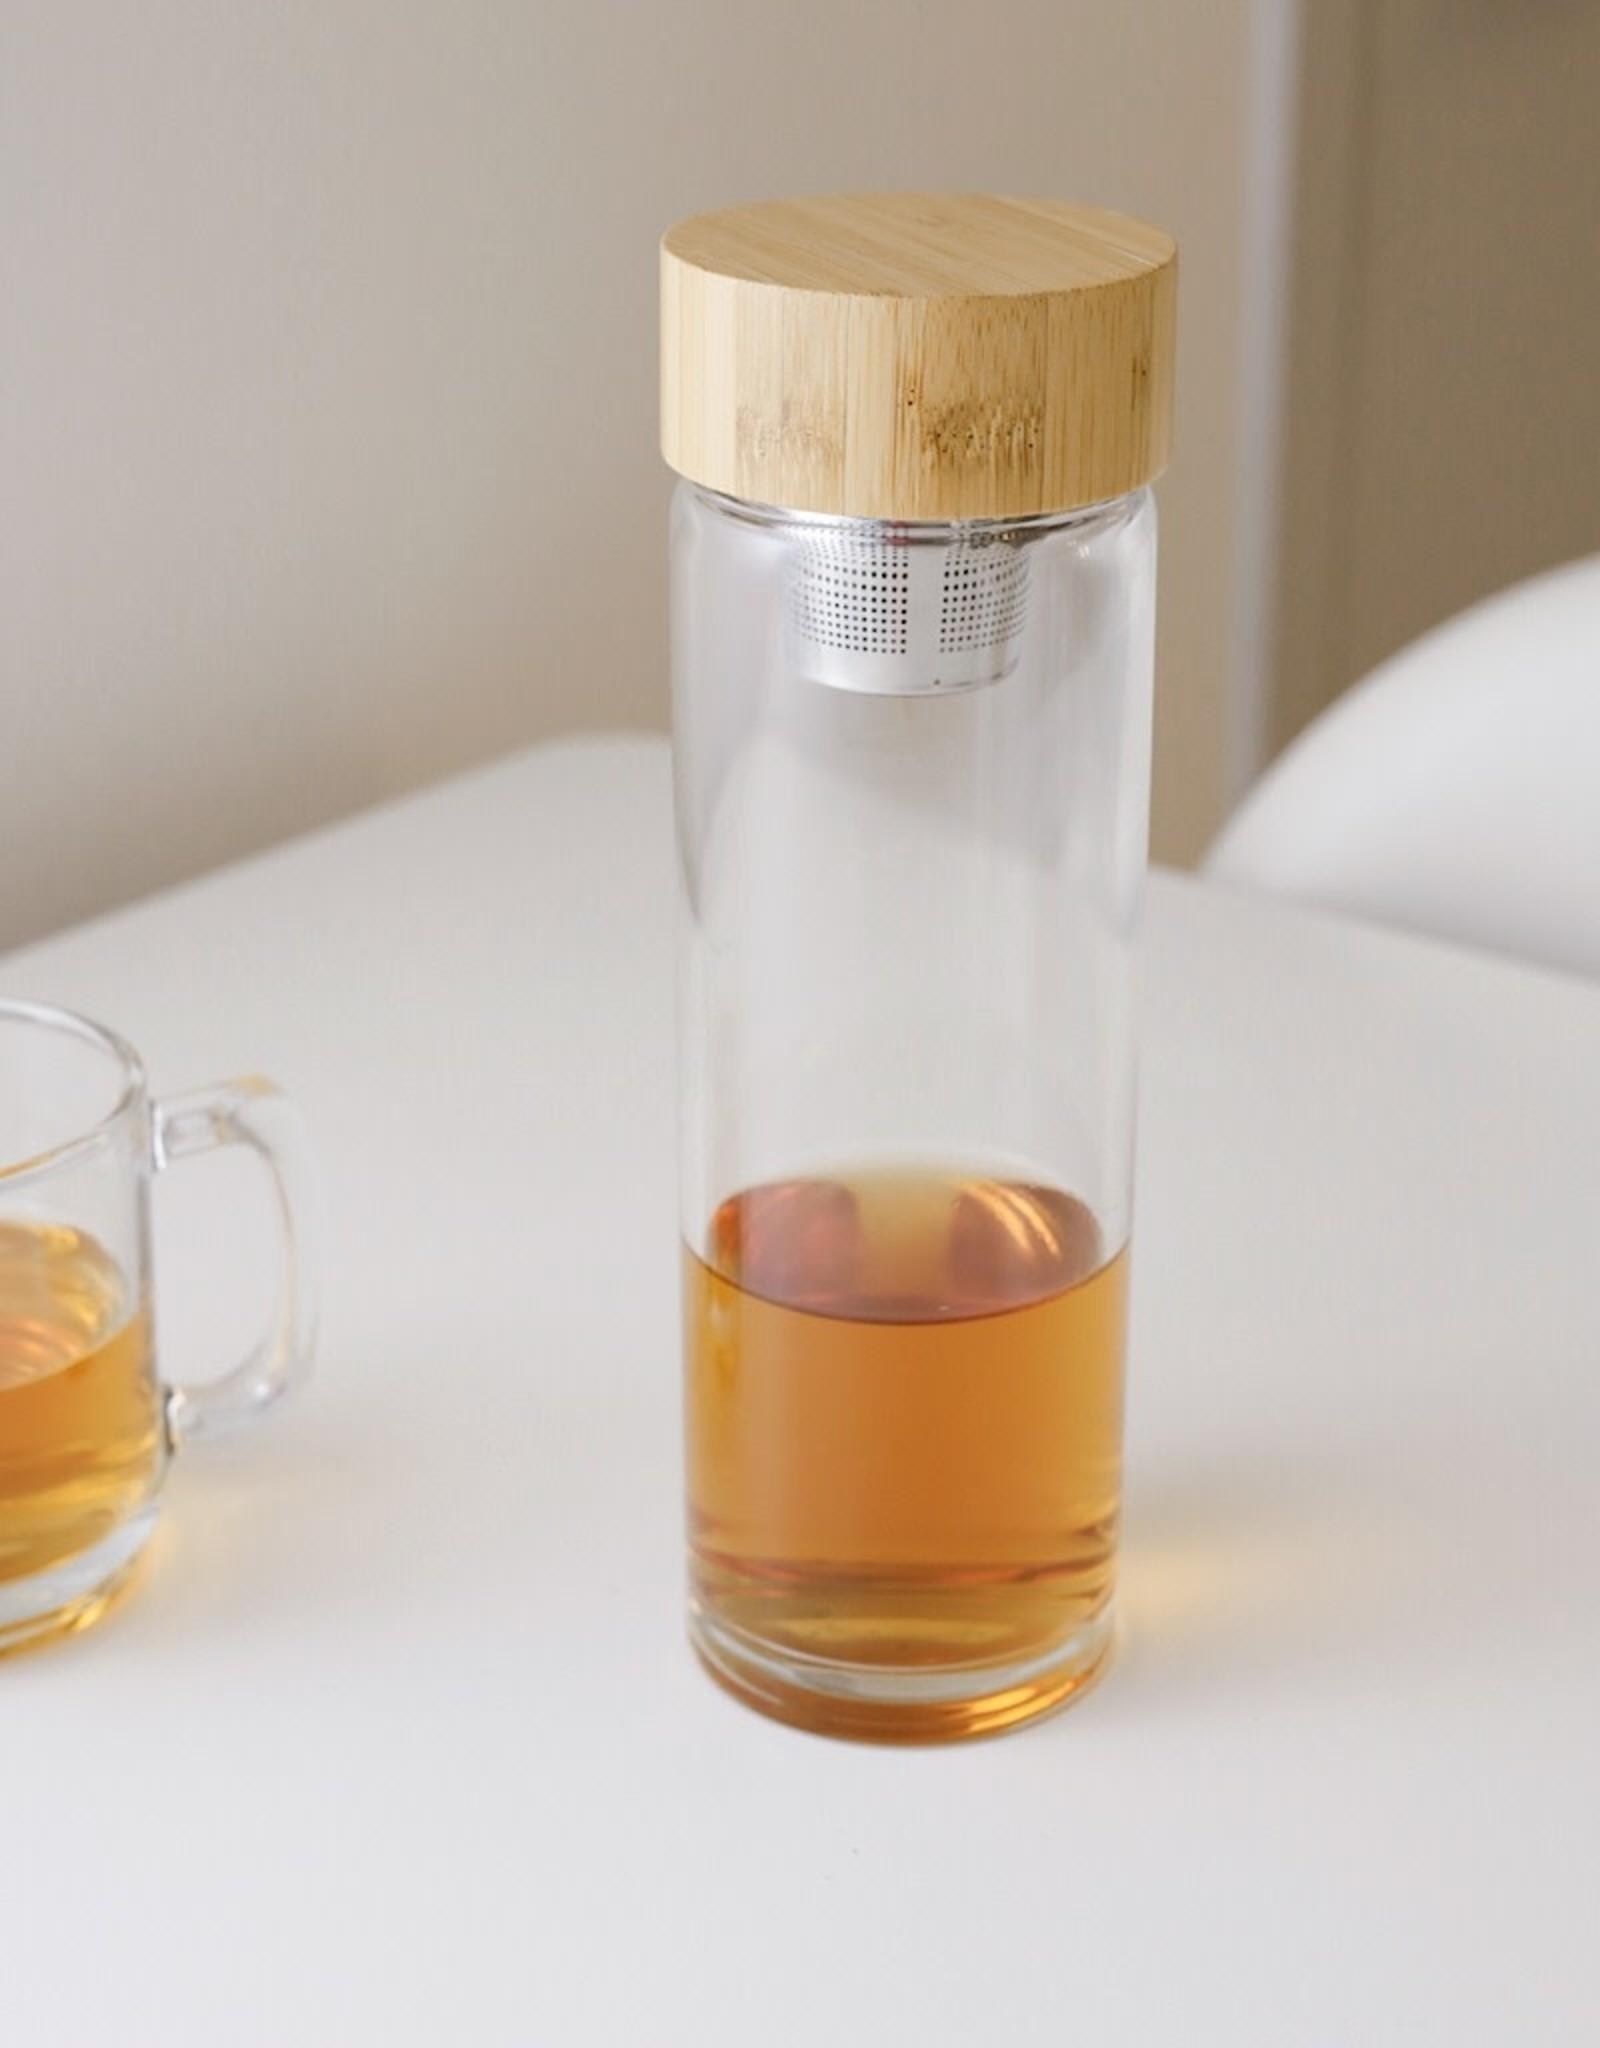 Kikkerland Zen Tea Infuser